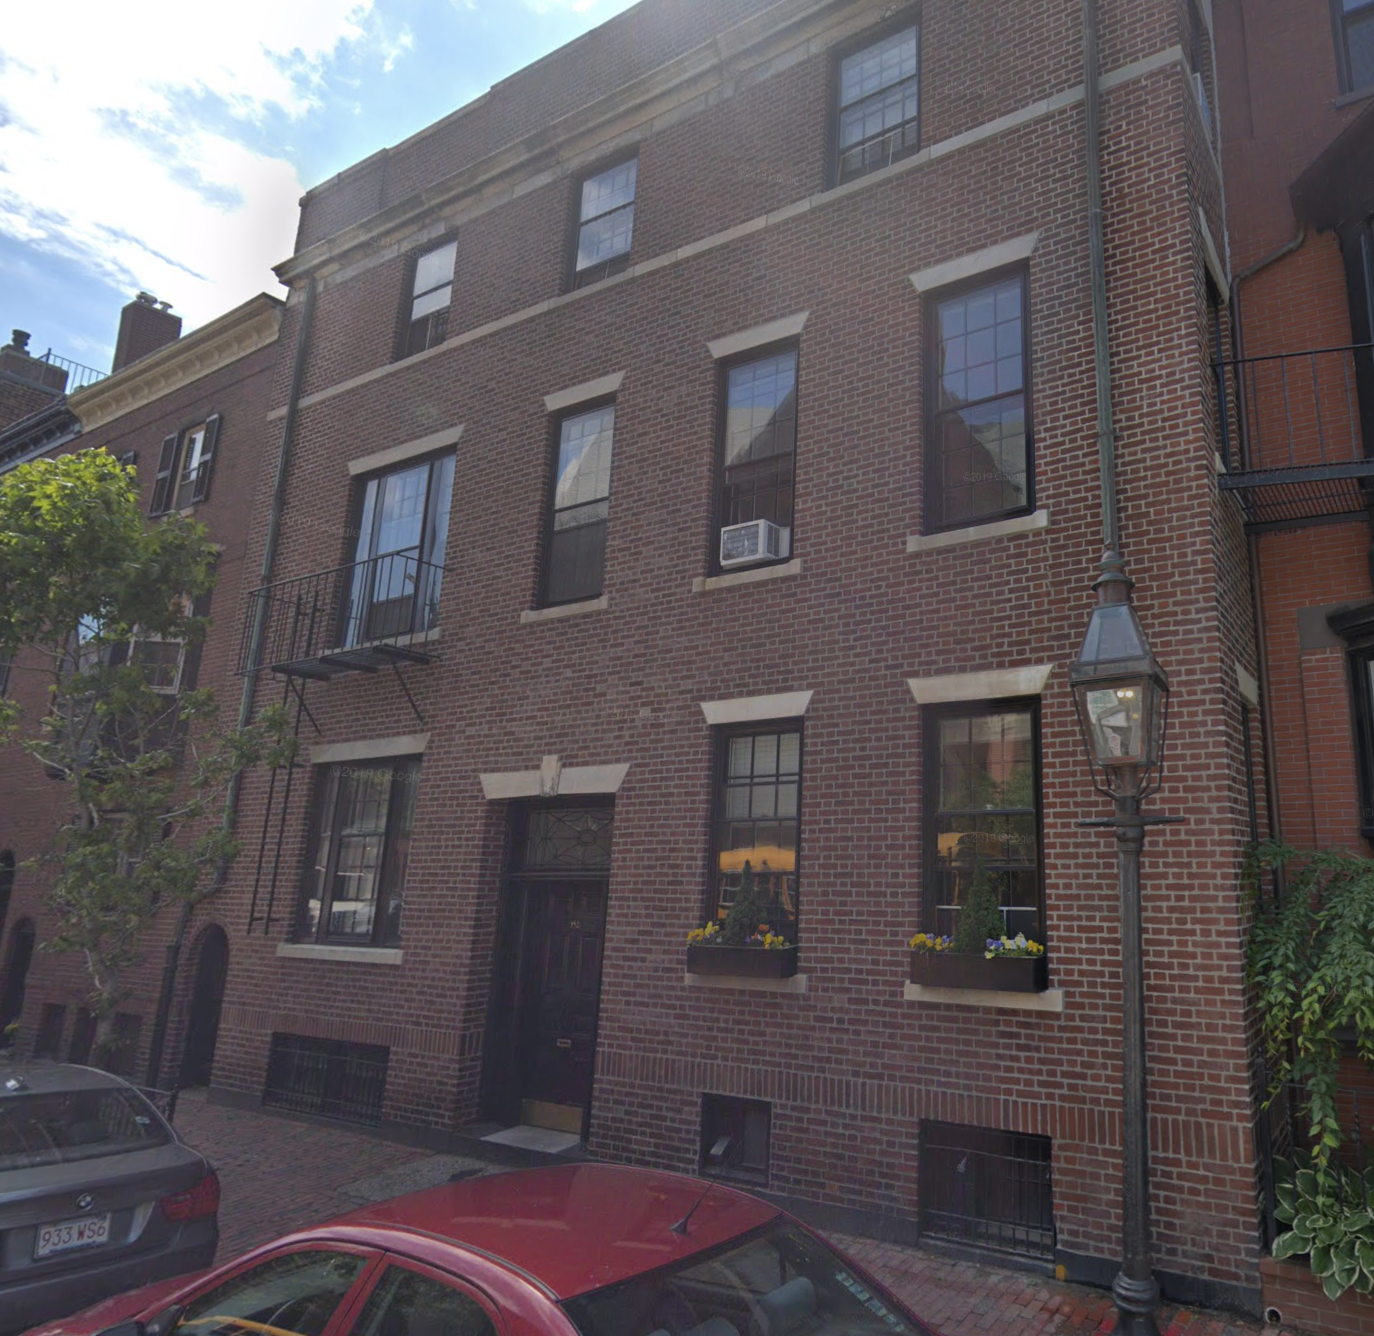 Bldup - 152 Mount Vernon Street